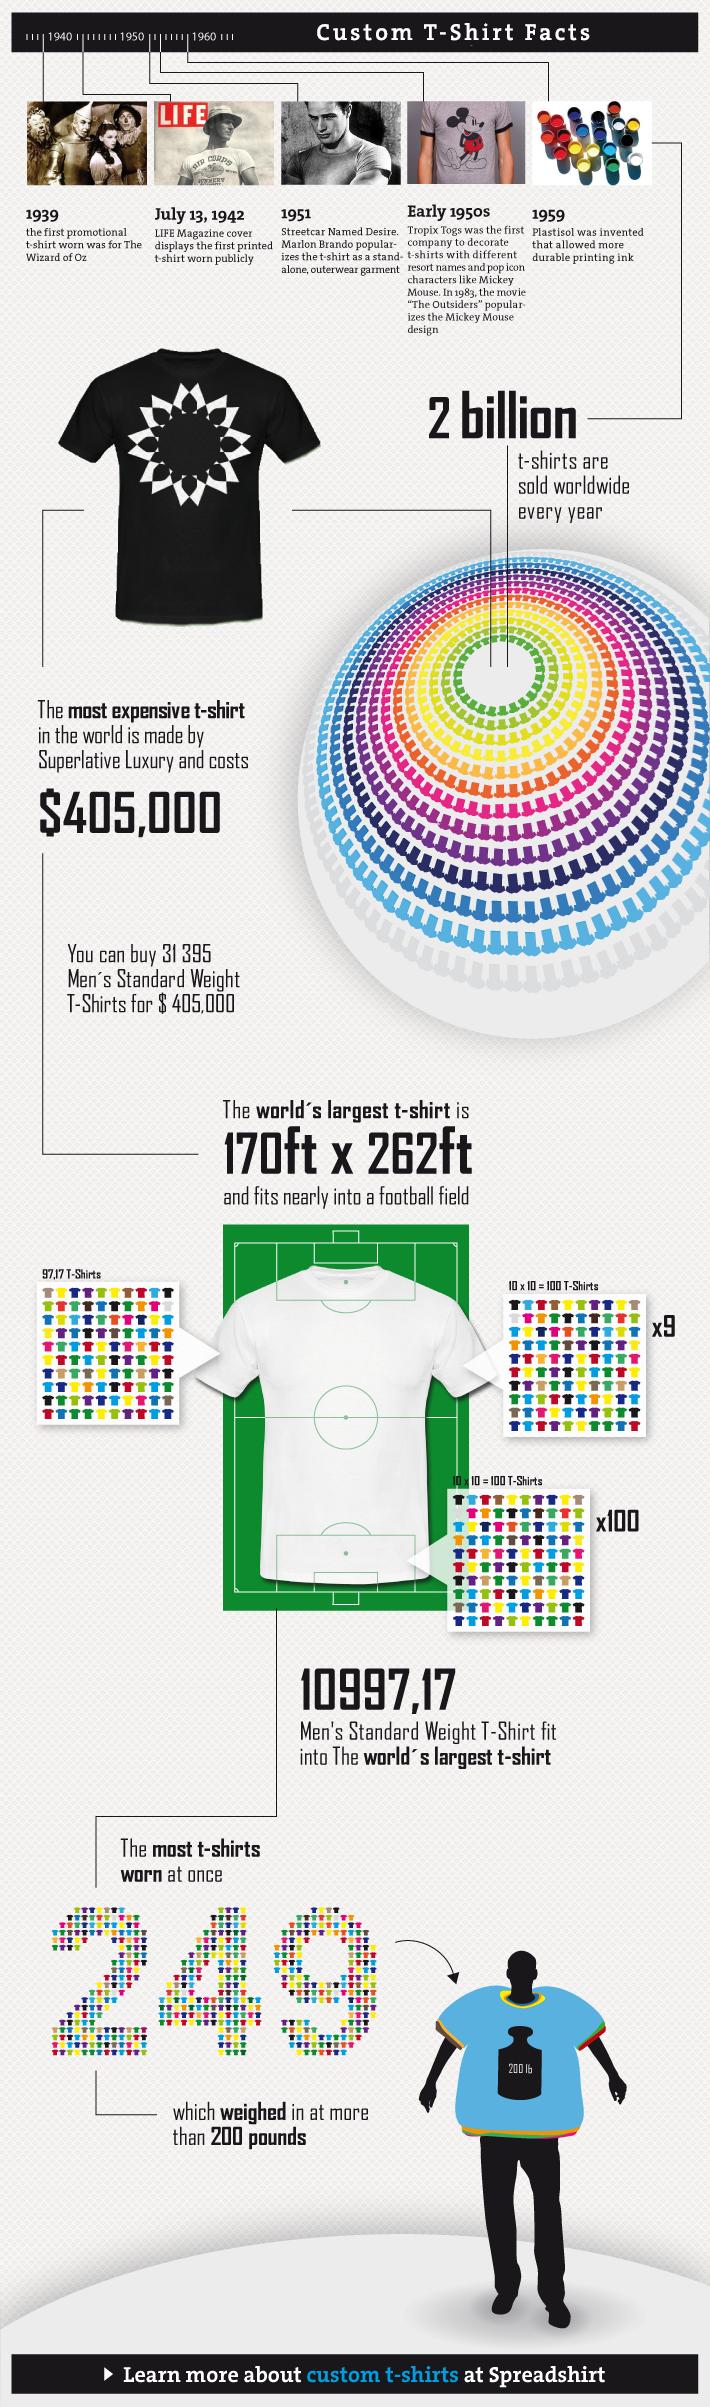 Custom Tshirt Industry Facts